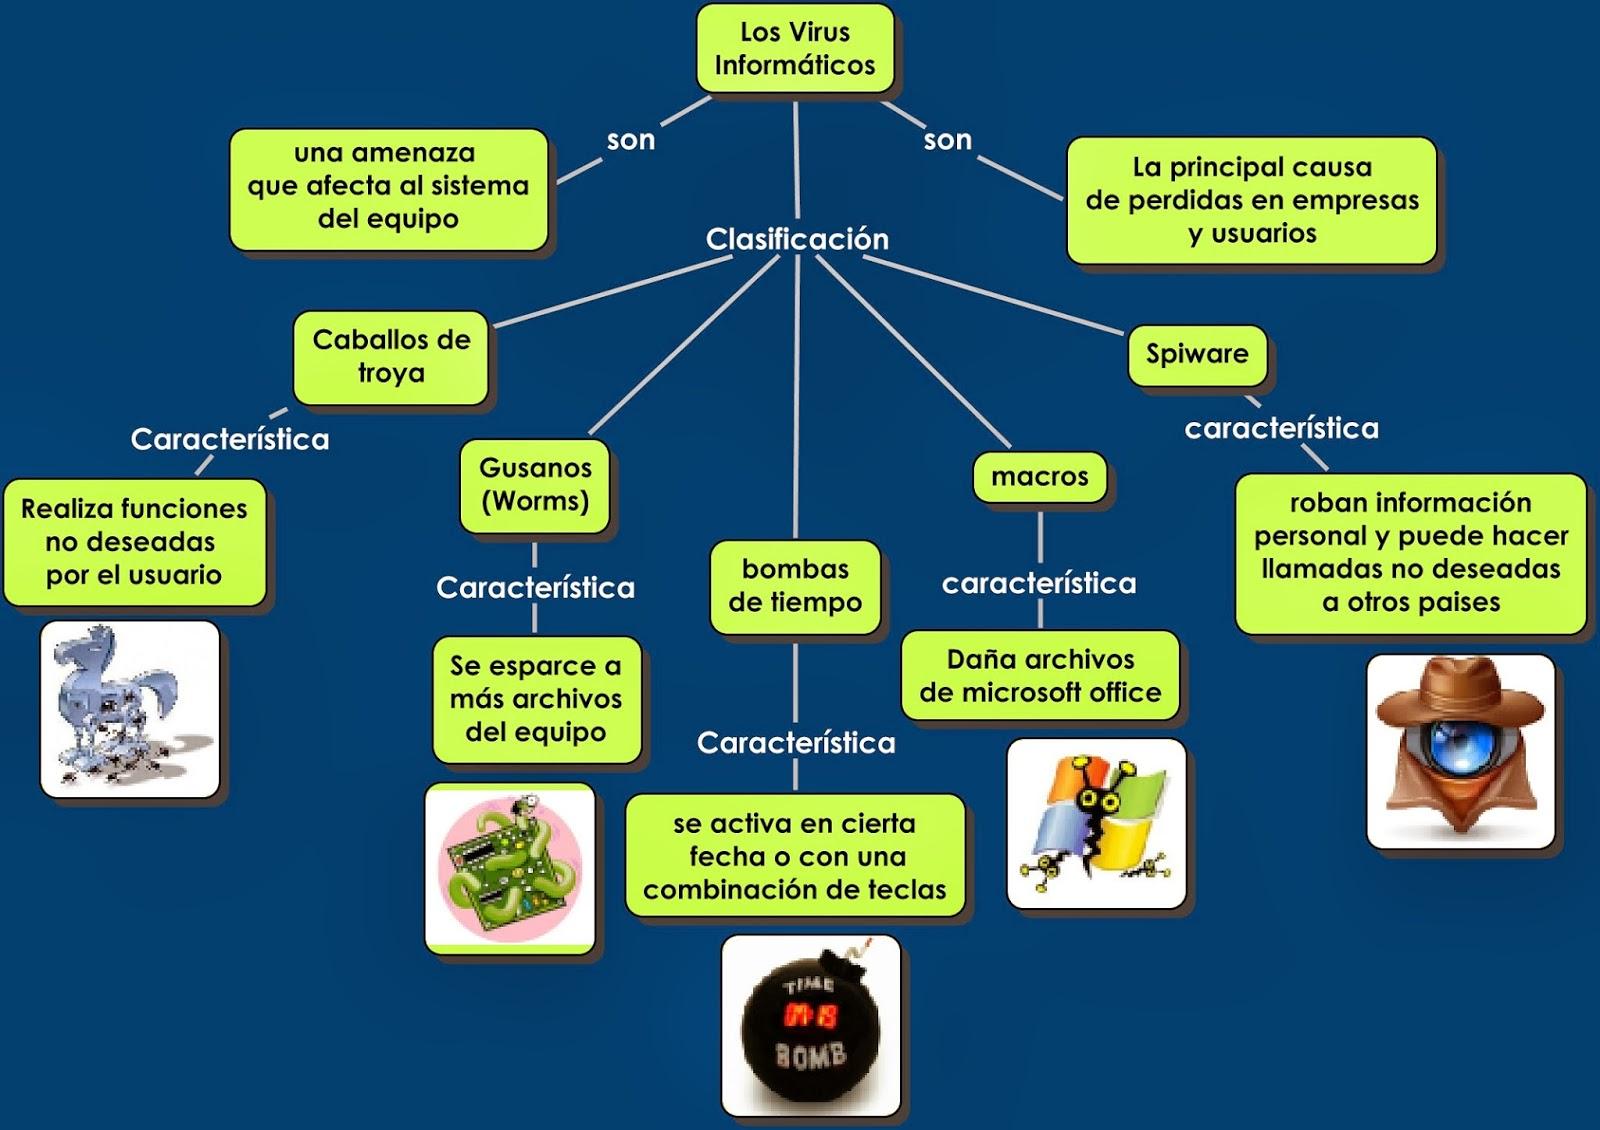 10 antivirus informaticos yahoo dating 8